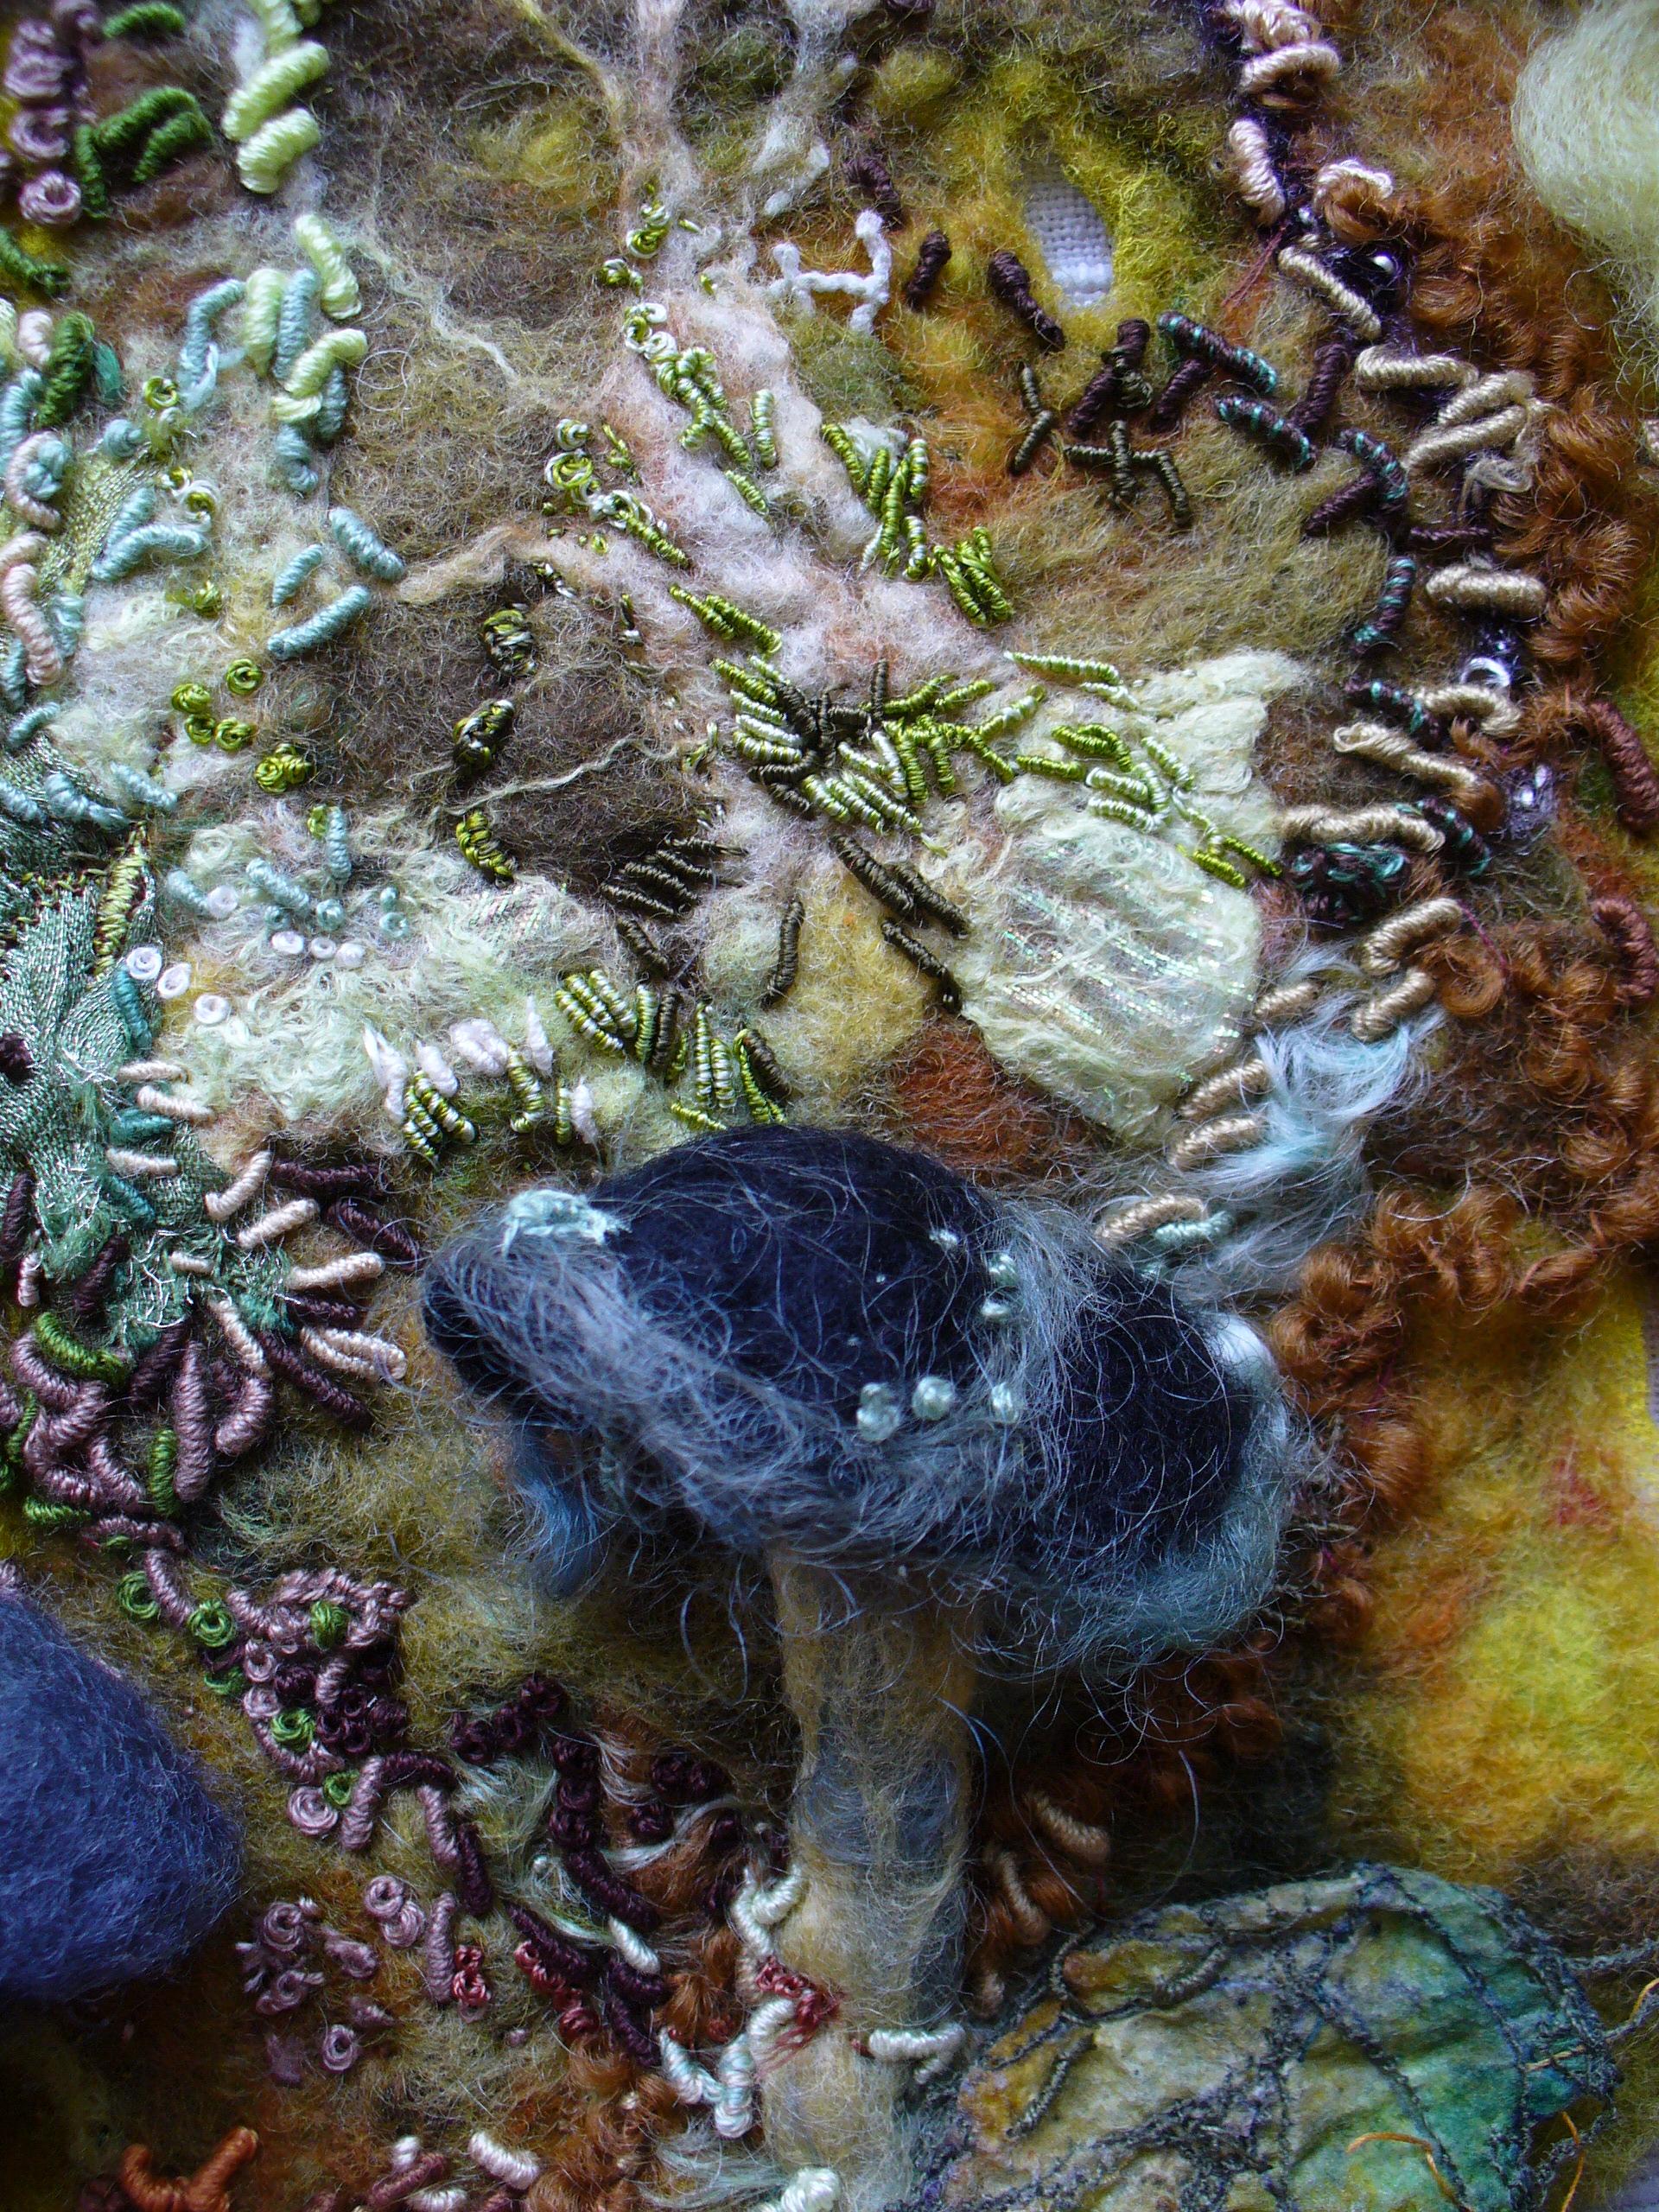 Enchanted Wood II (detail) by Cathy Turner